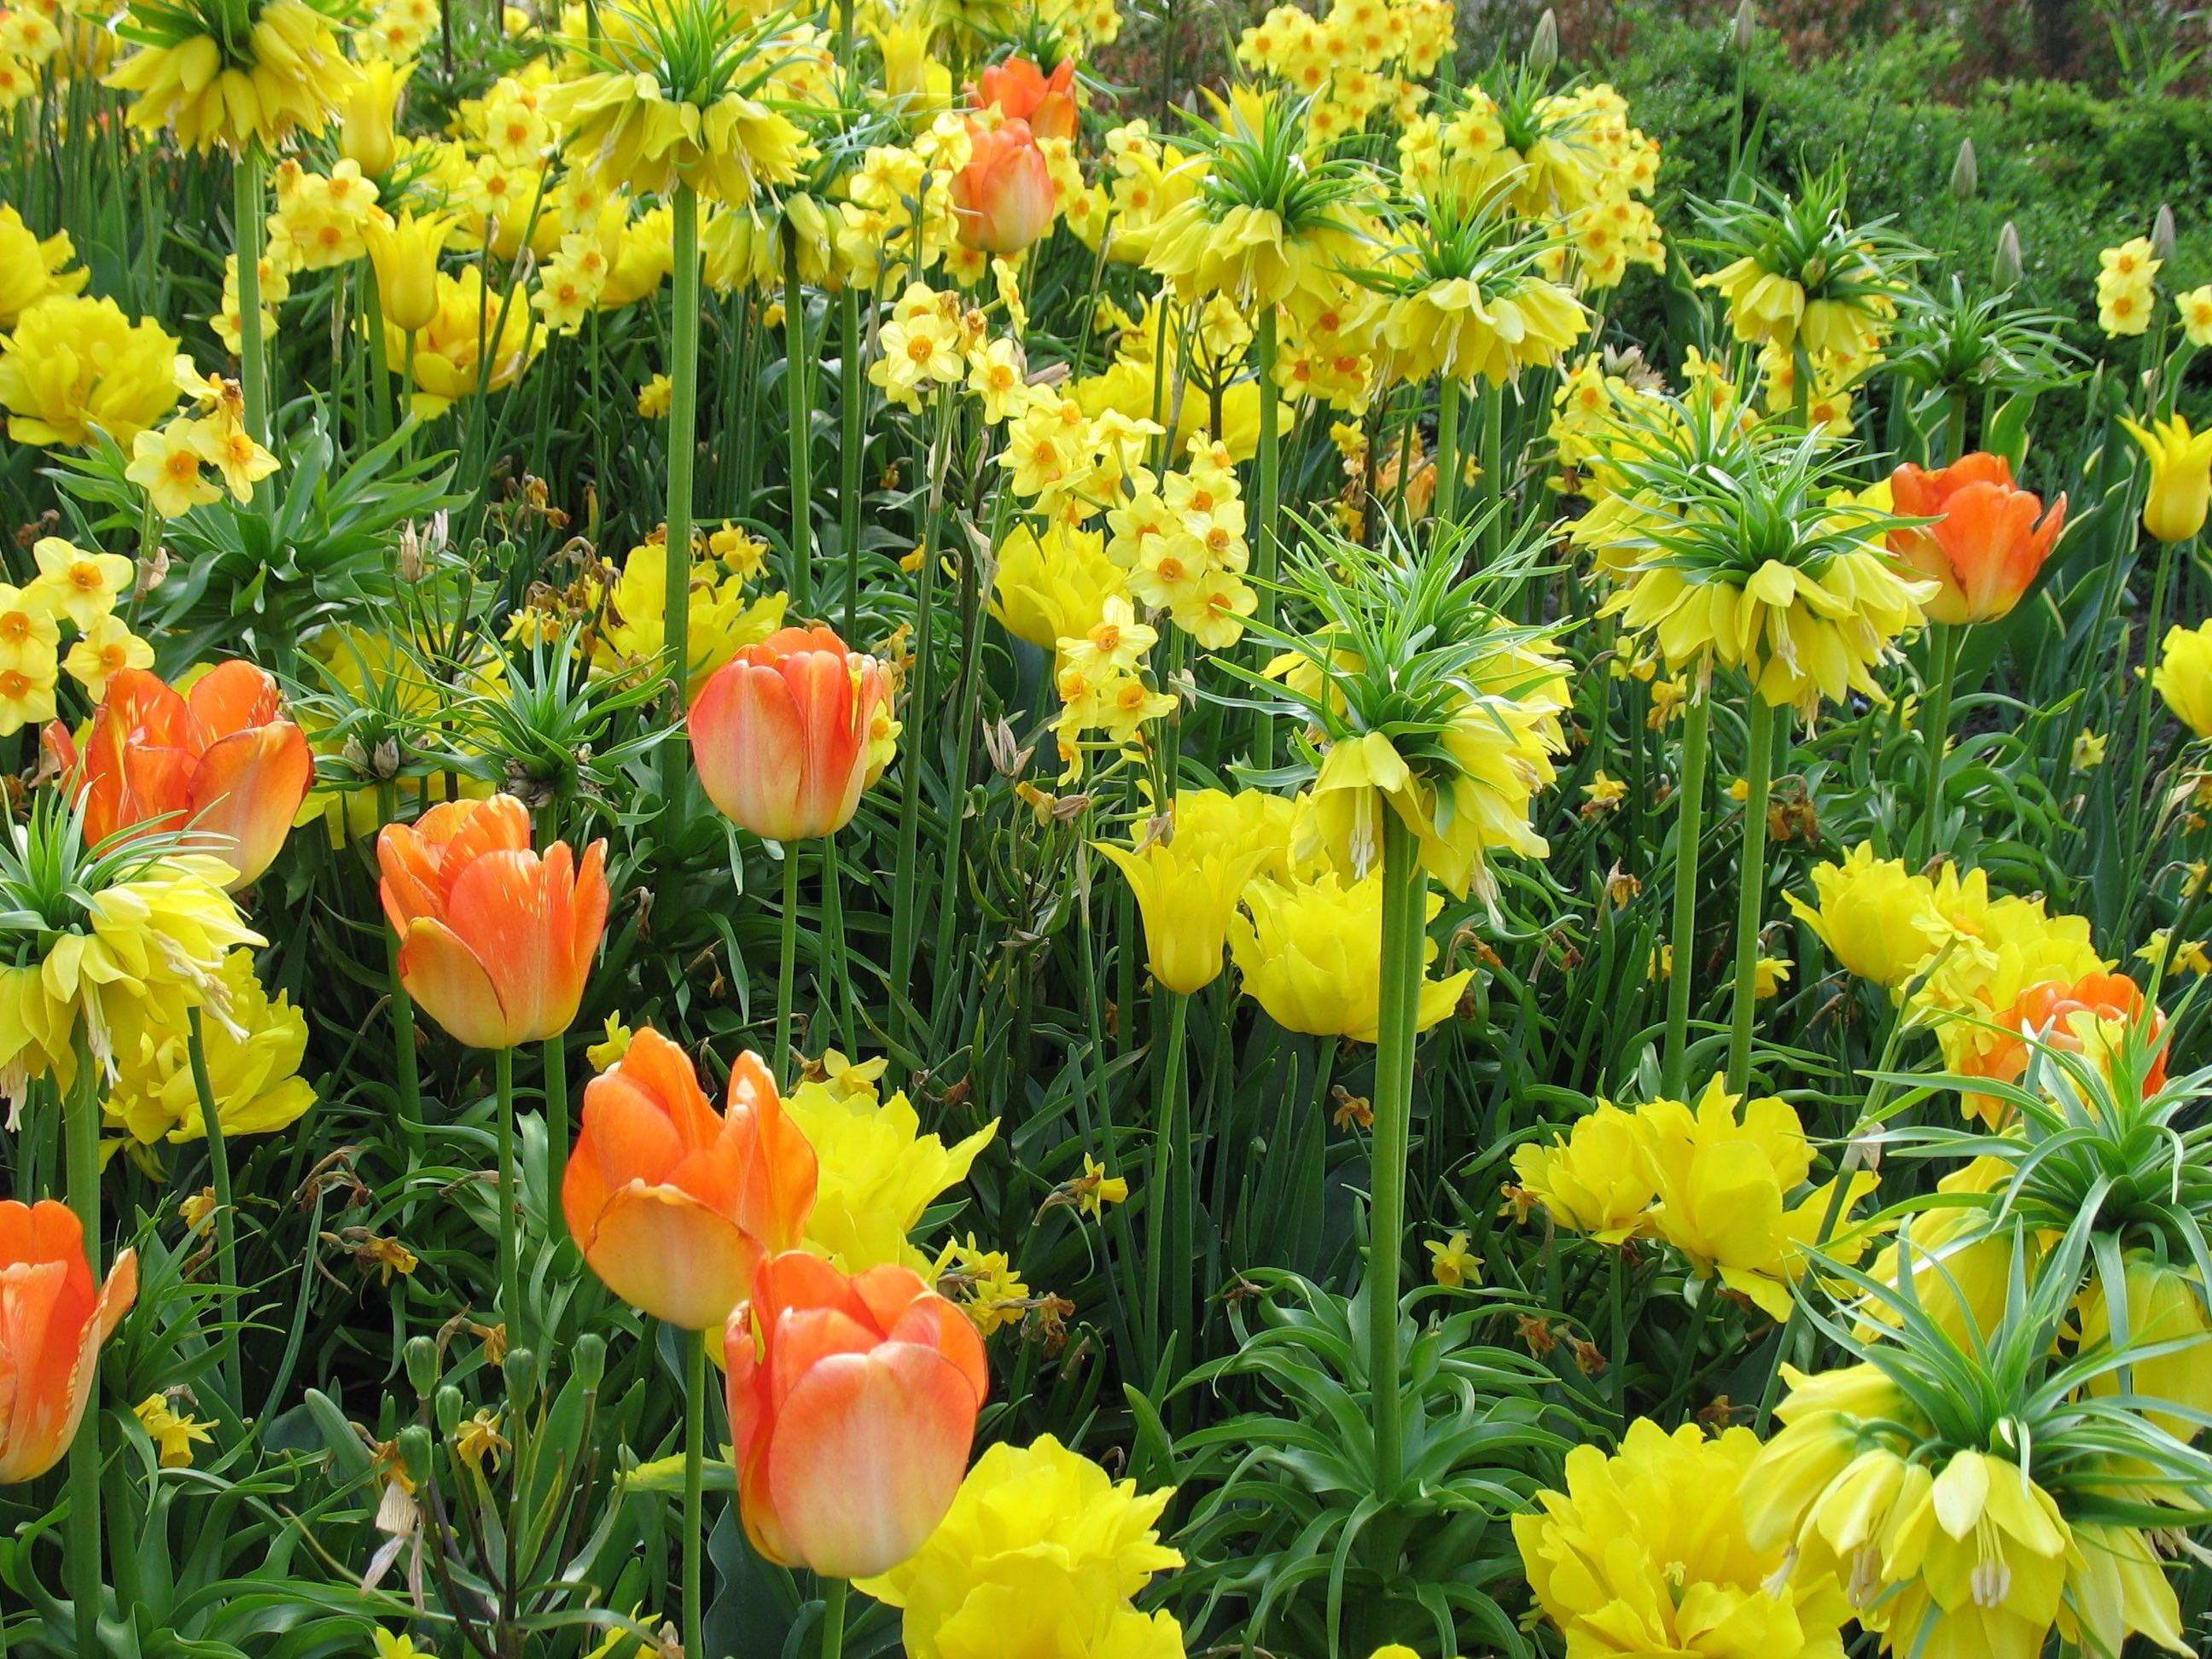 Holland_Keukenhof tulips narcissus fritillaria